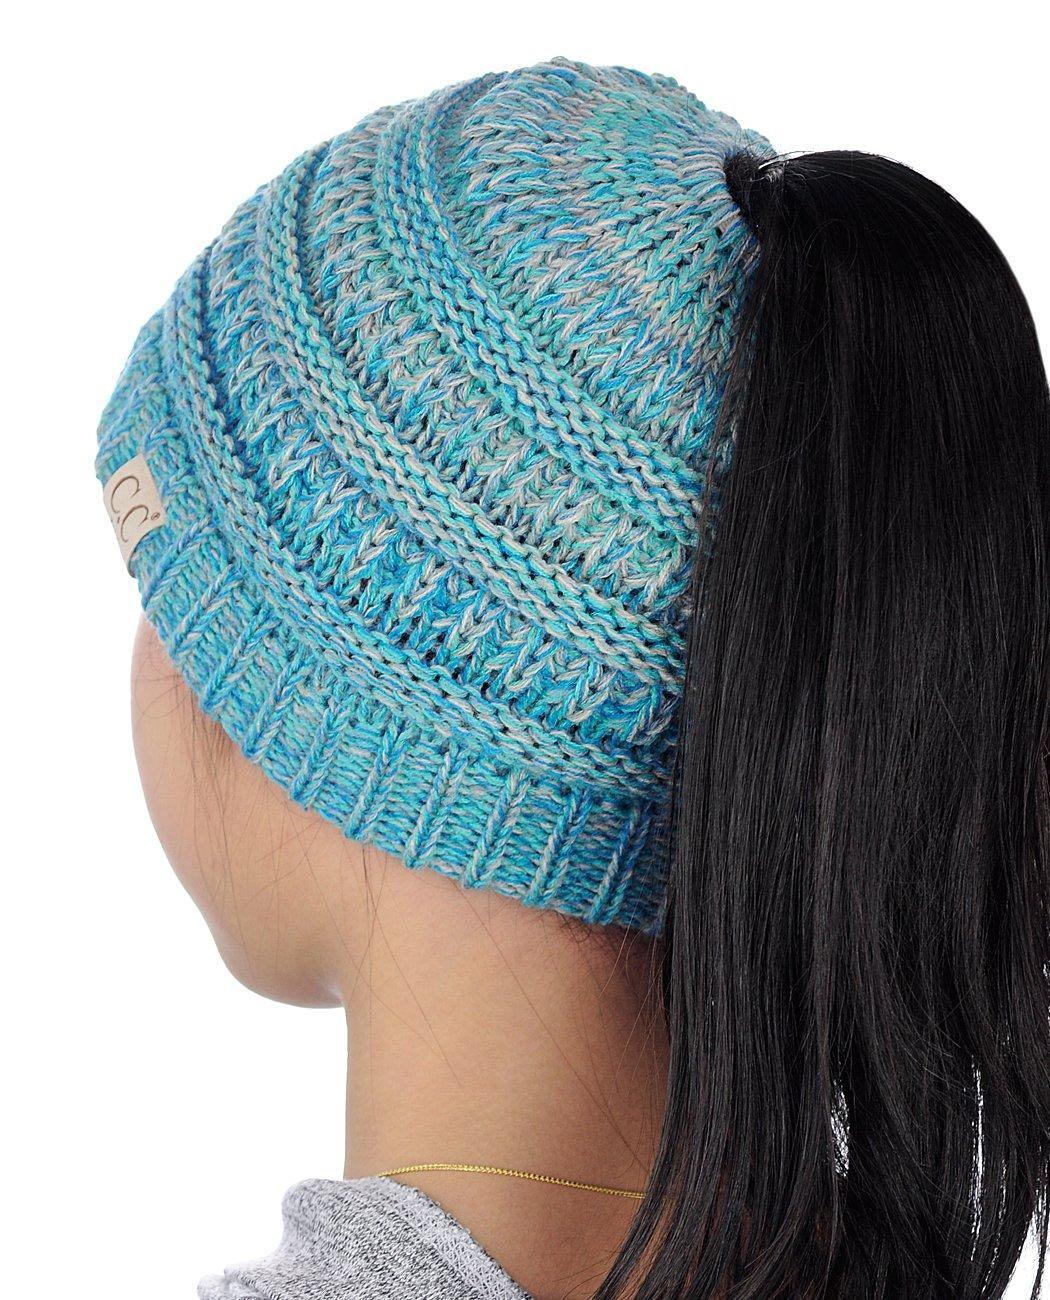 b32cb1b87d72 C.C BeanieTail Kids' Children's Soft Cable Knit Messy High Bun Ponytail  Beanie Hat